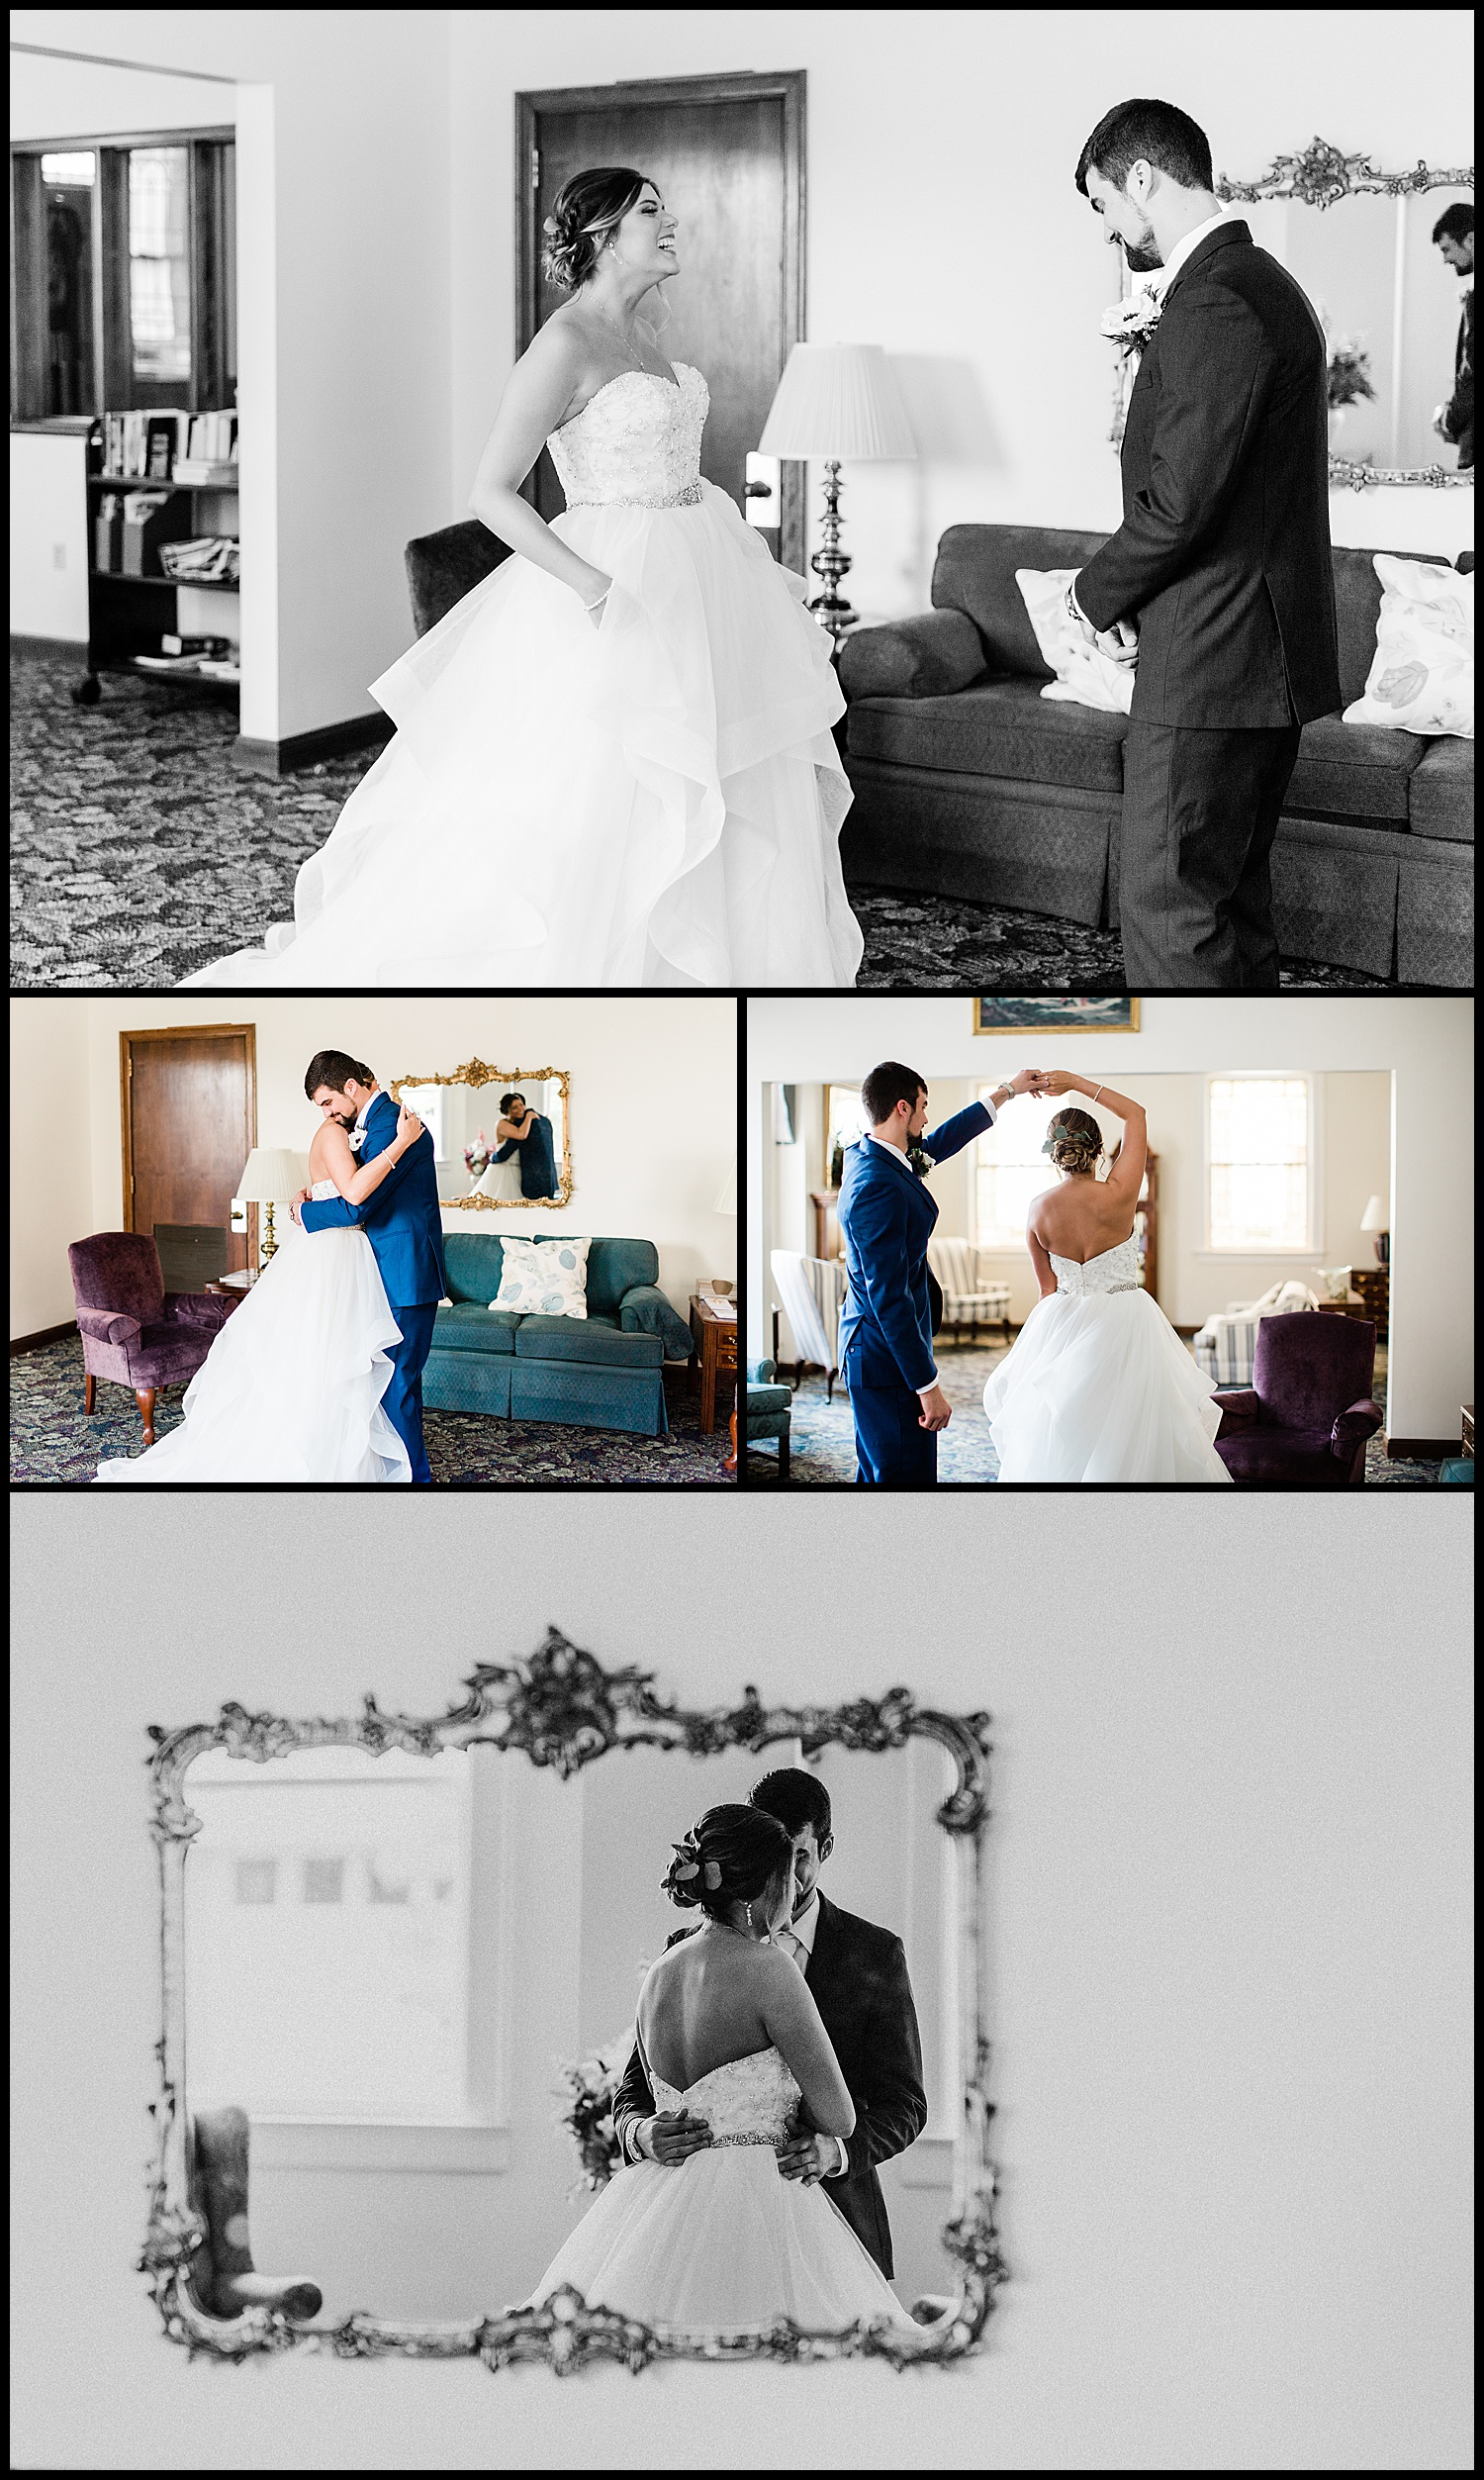 Natural-charlottesville-virginia-wedding-photographer_0019.jpg